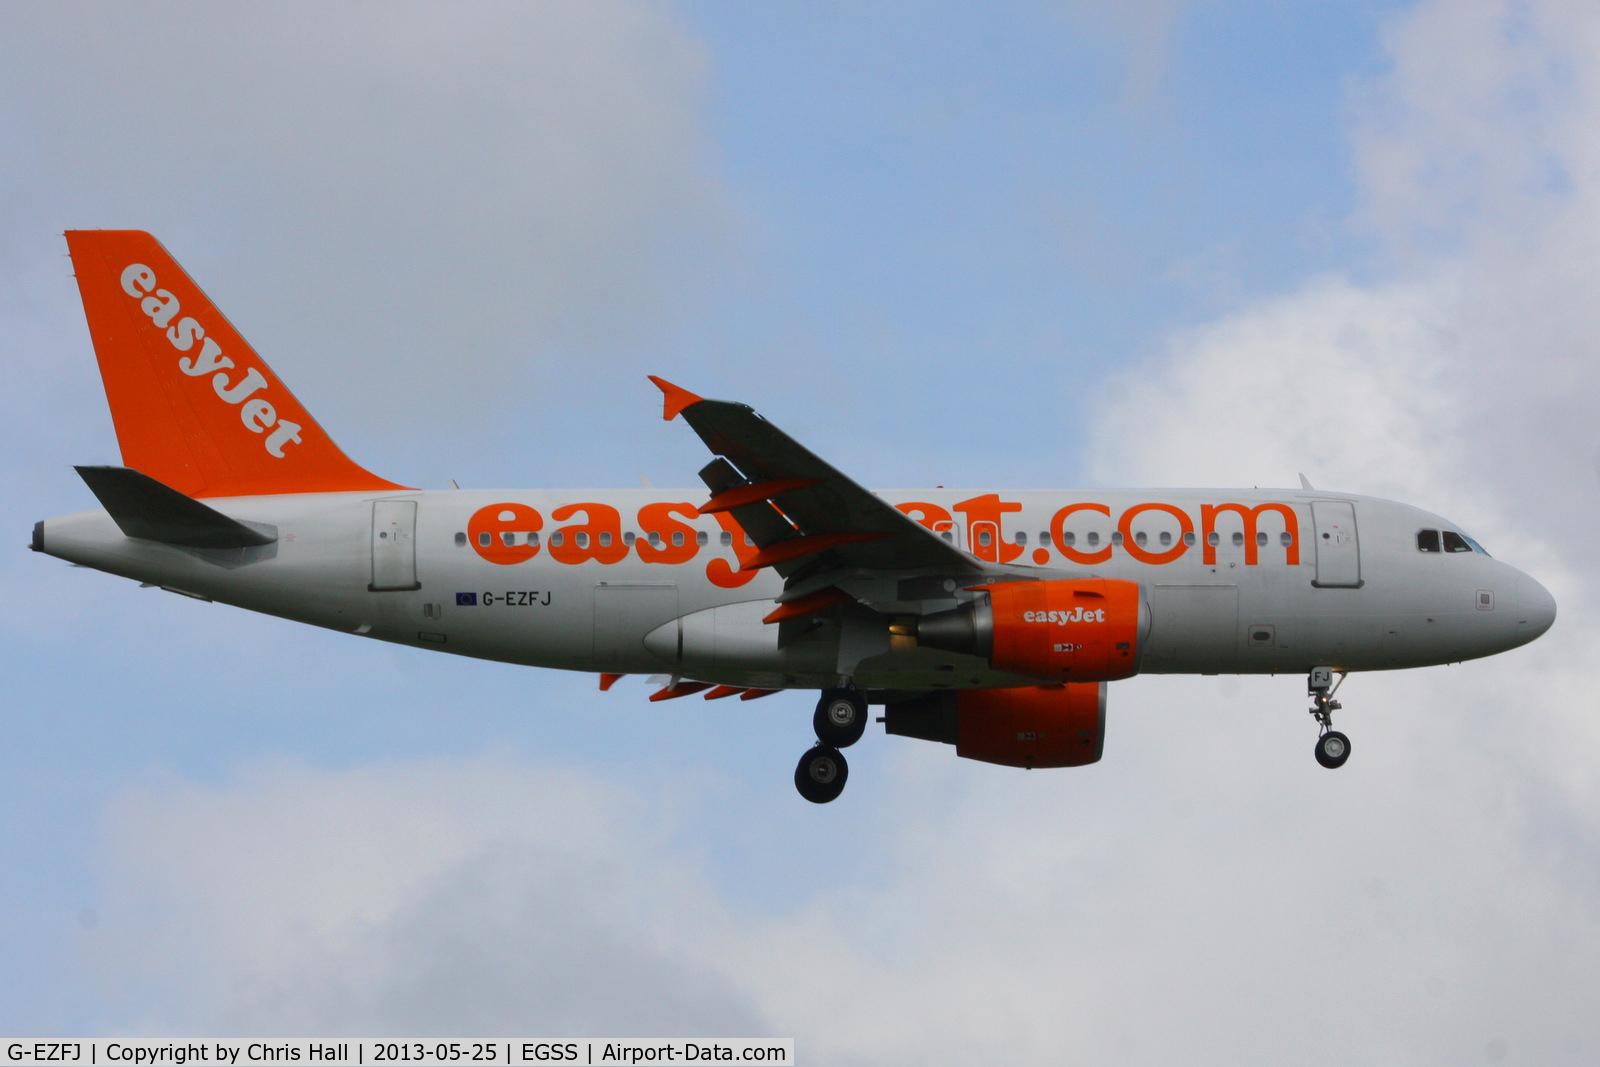 G-EZFJ, 2009 Airbus A319-111 C/N 4040, easyJet